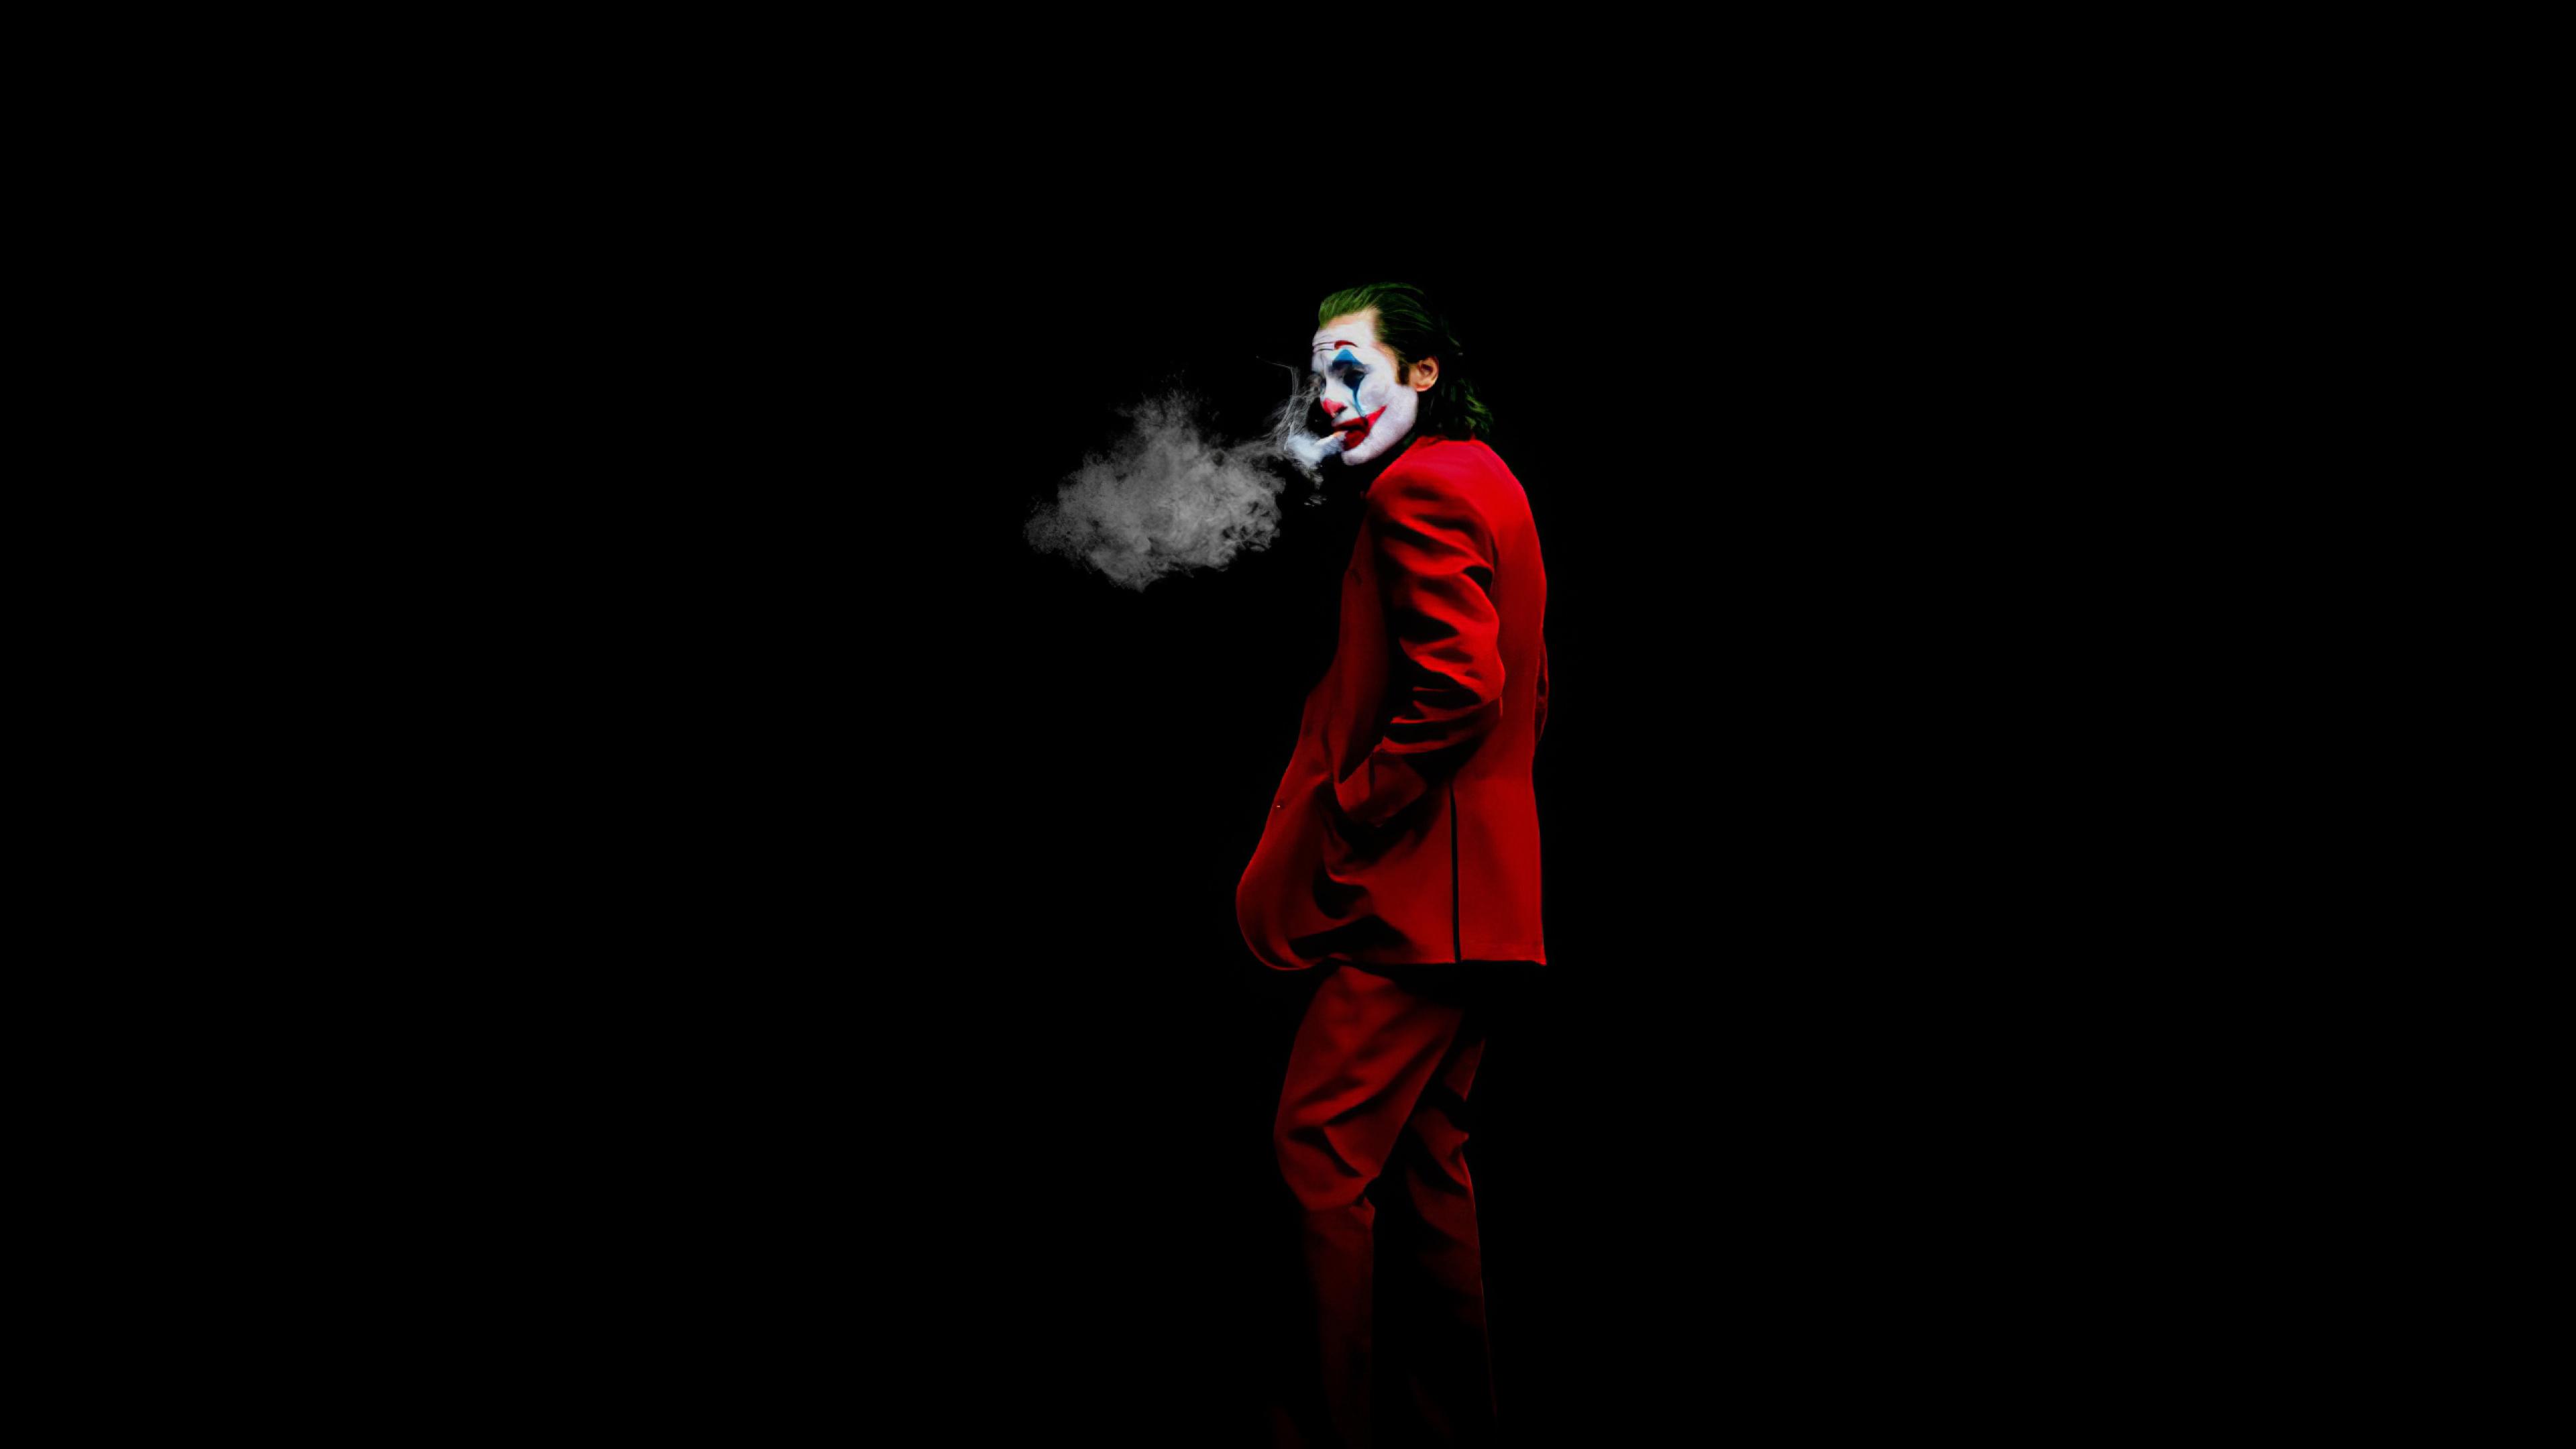 New Joker 2020 Art Wallpaper in 3840x2160 Resolution